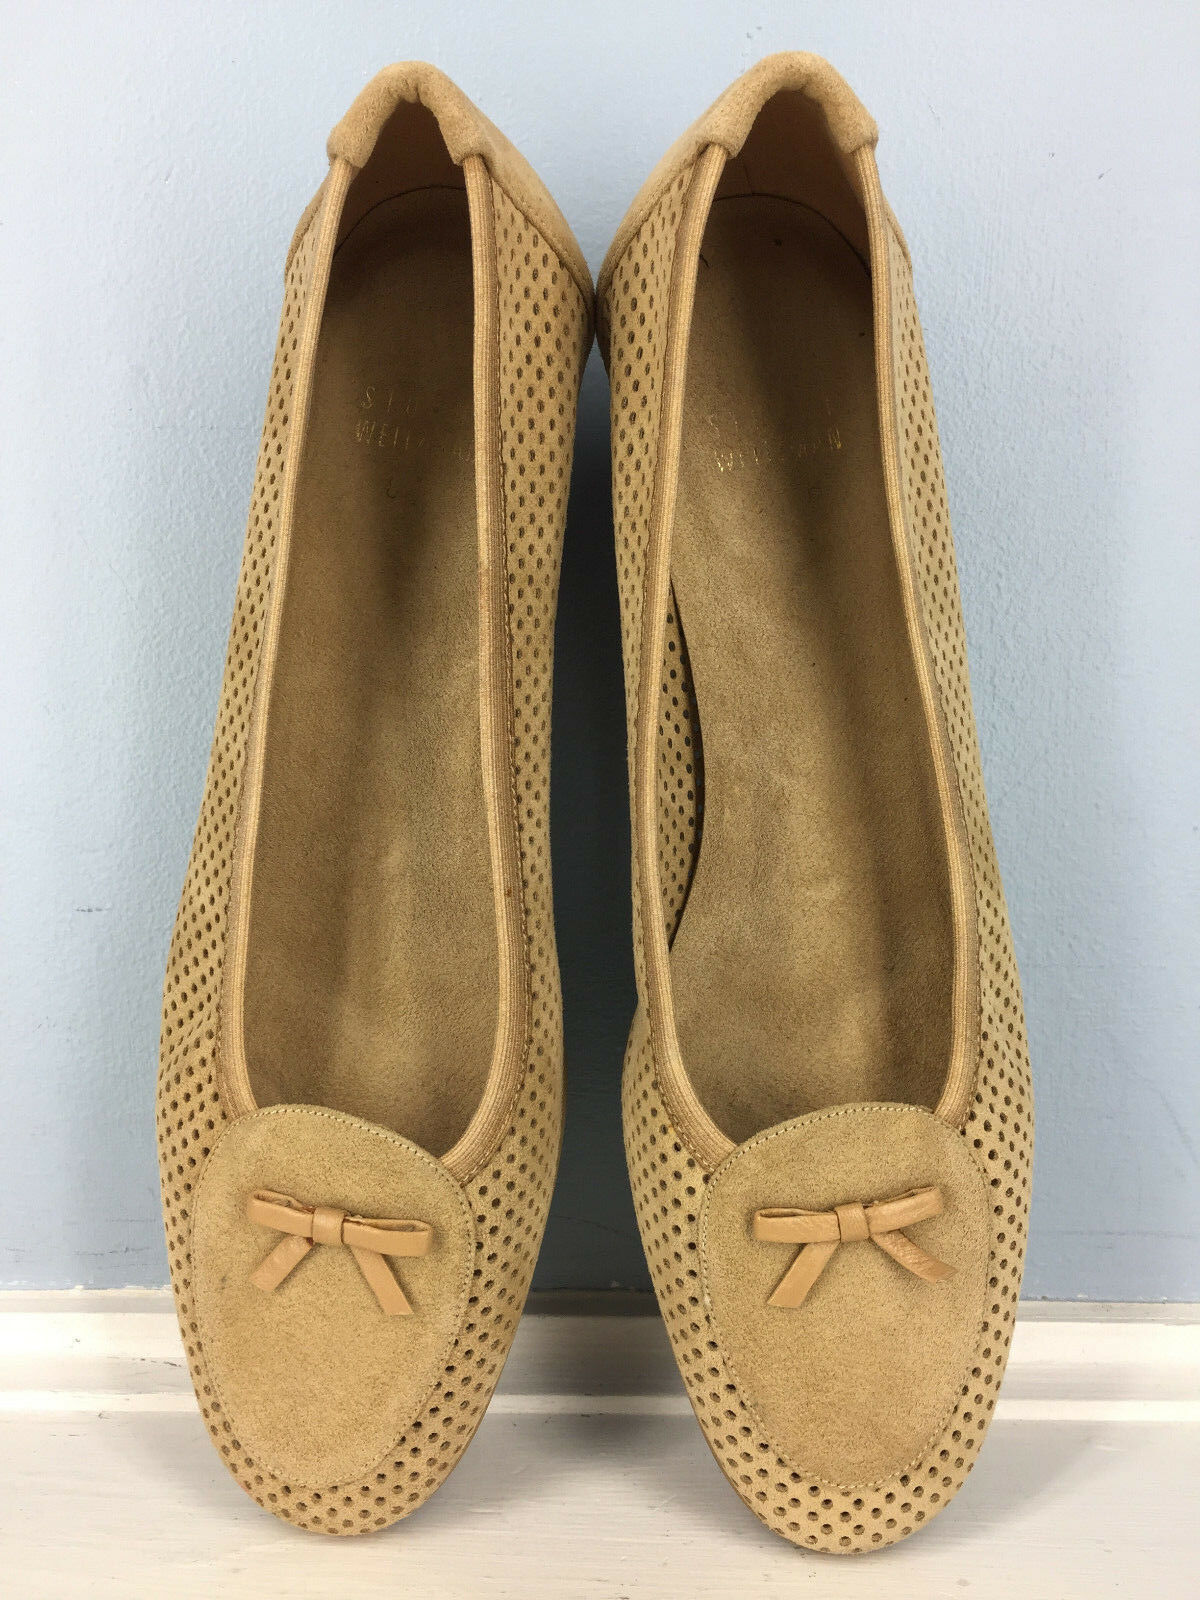 STUART WEITZMAN tan brown leather perforated kitten heel loafer 8 Career Cocktai